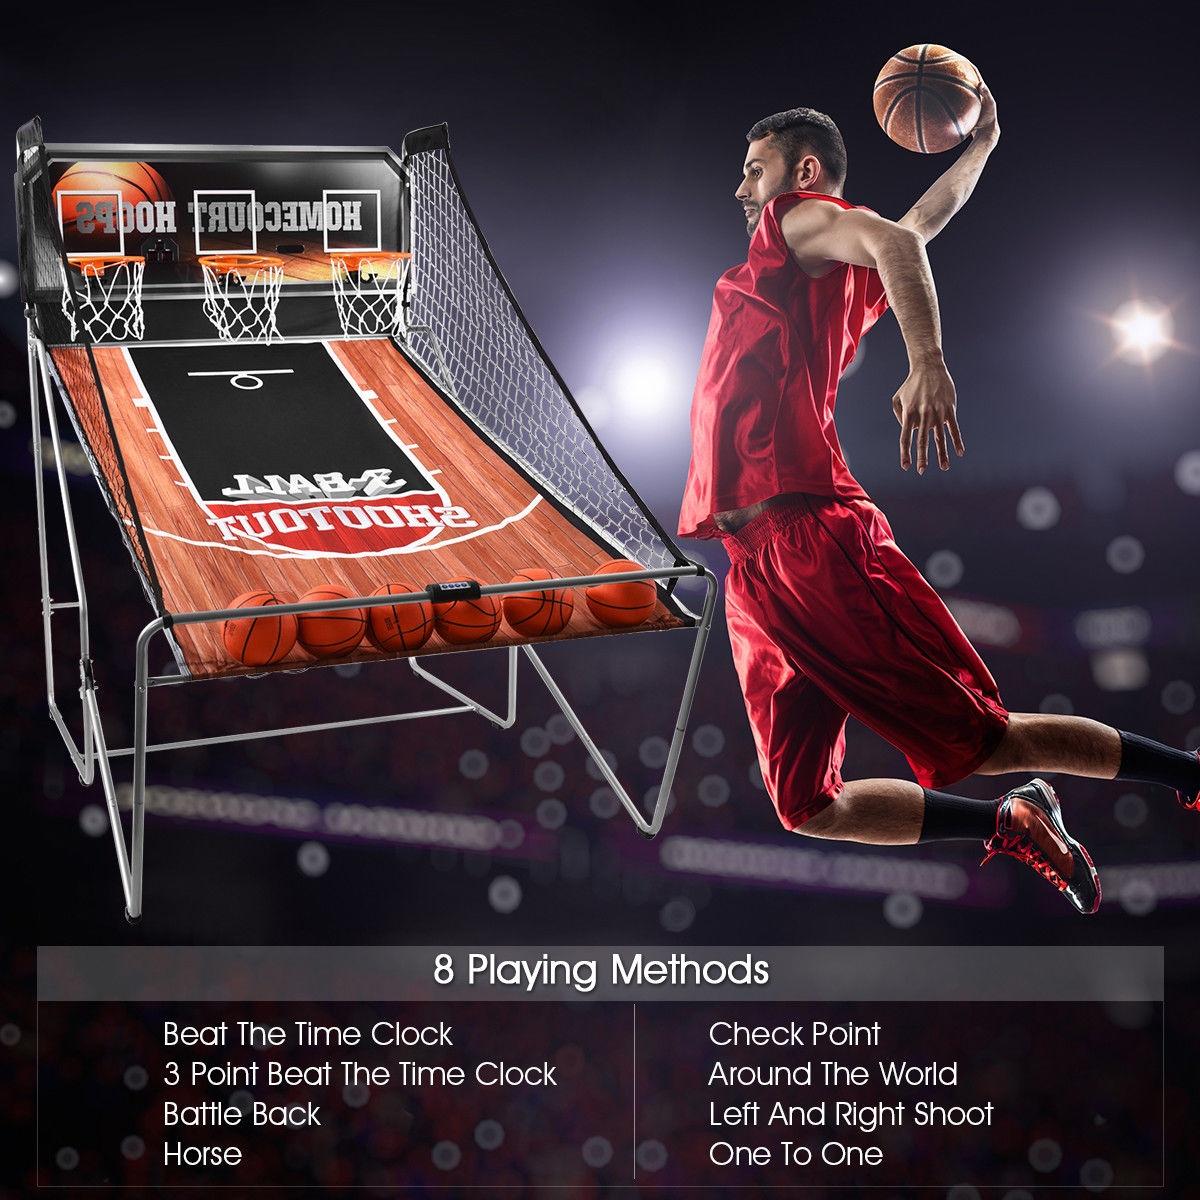 Indoor 3 Player Electronic Hoops Basketball Arcade Game